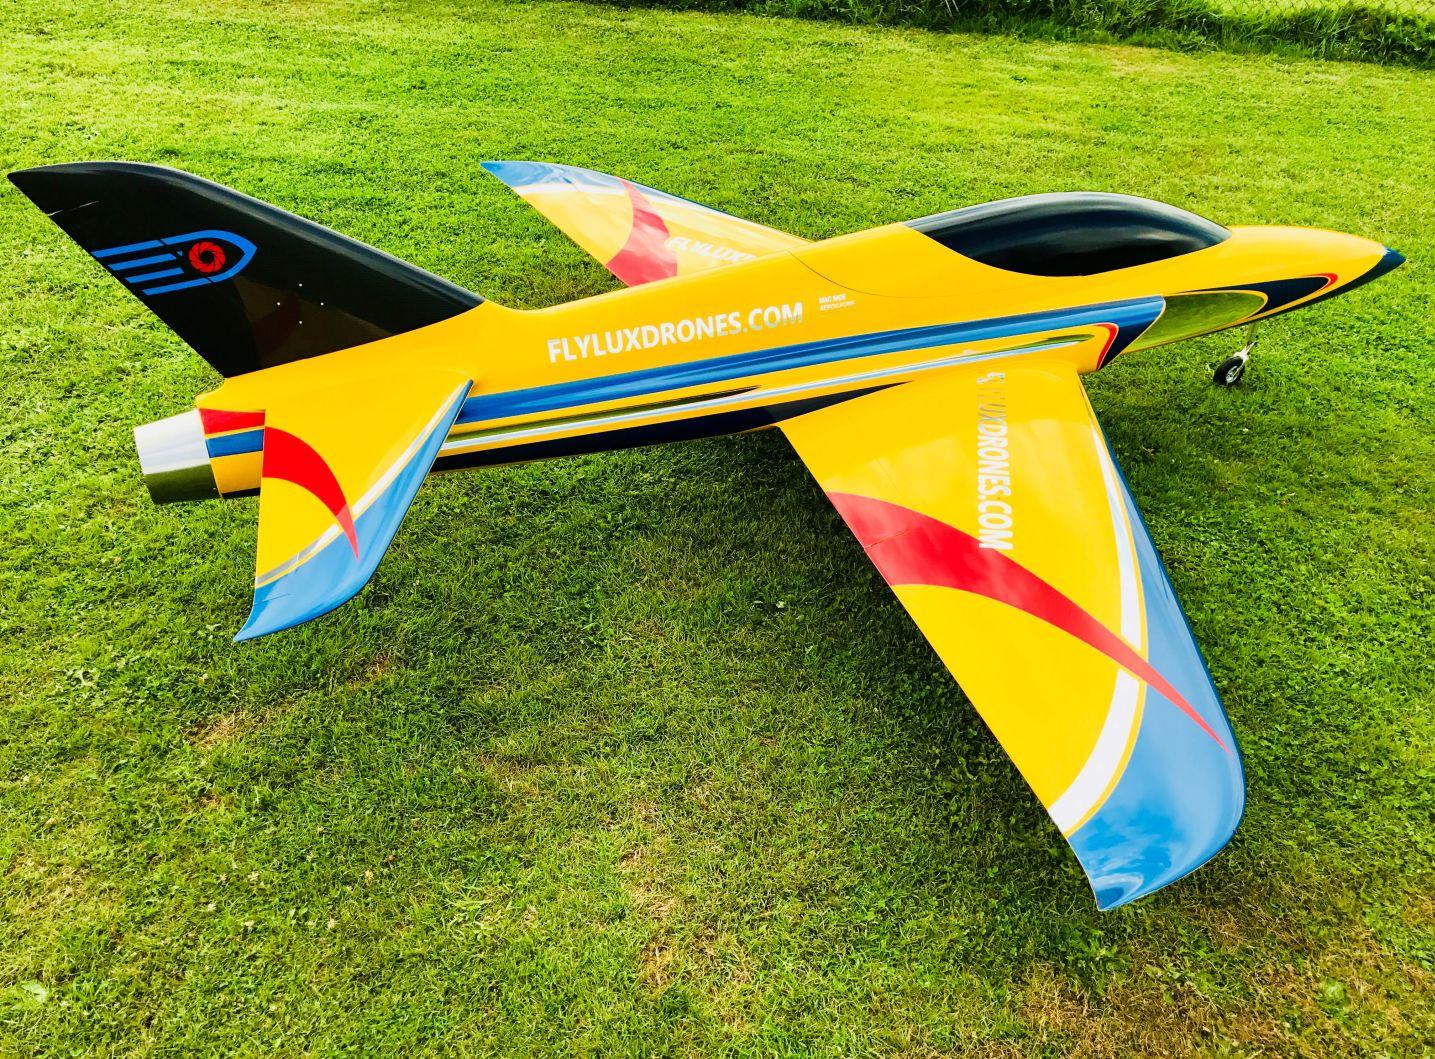 Demo Jet Lux-Drones